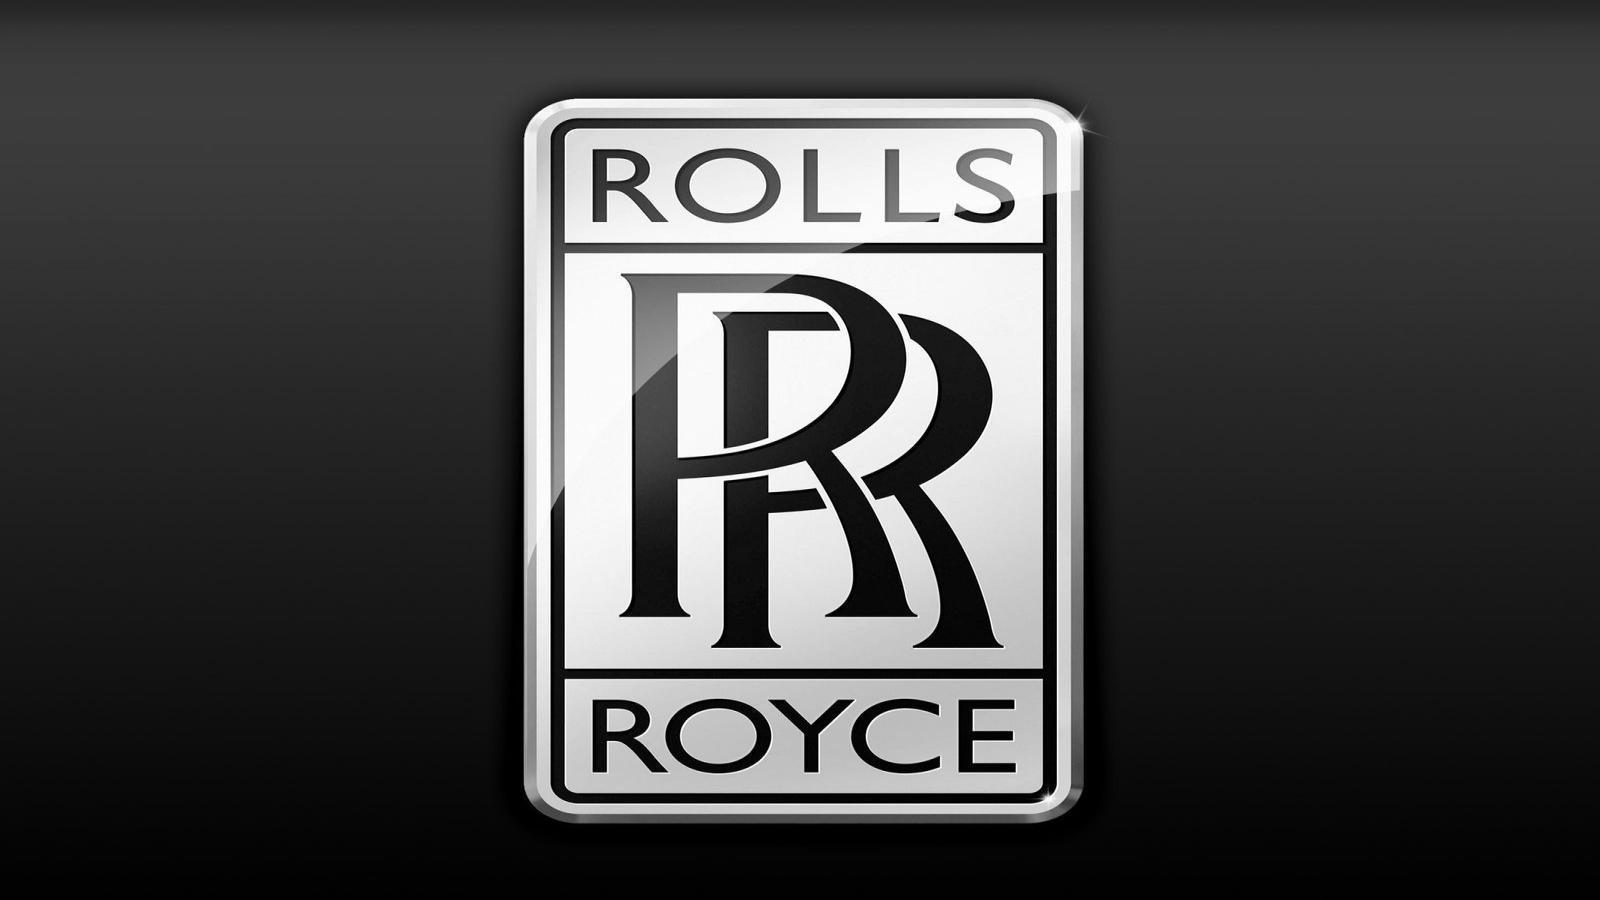 rolls royce logo wallpapers wallpaper cave. Black Bedroom Furniture Sets. Home Design Ideas